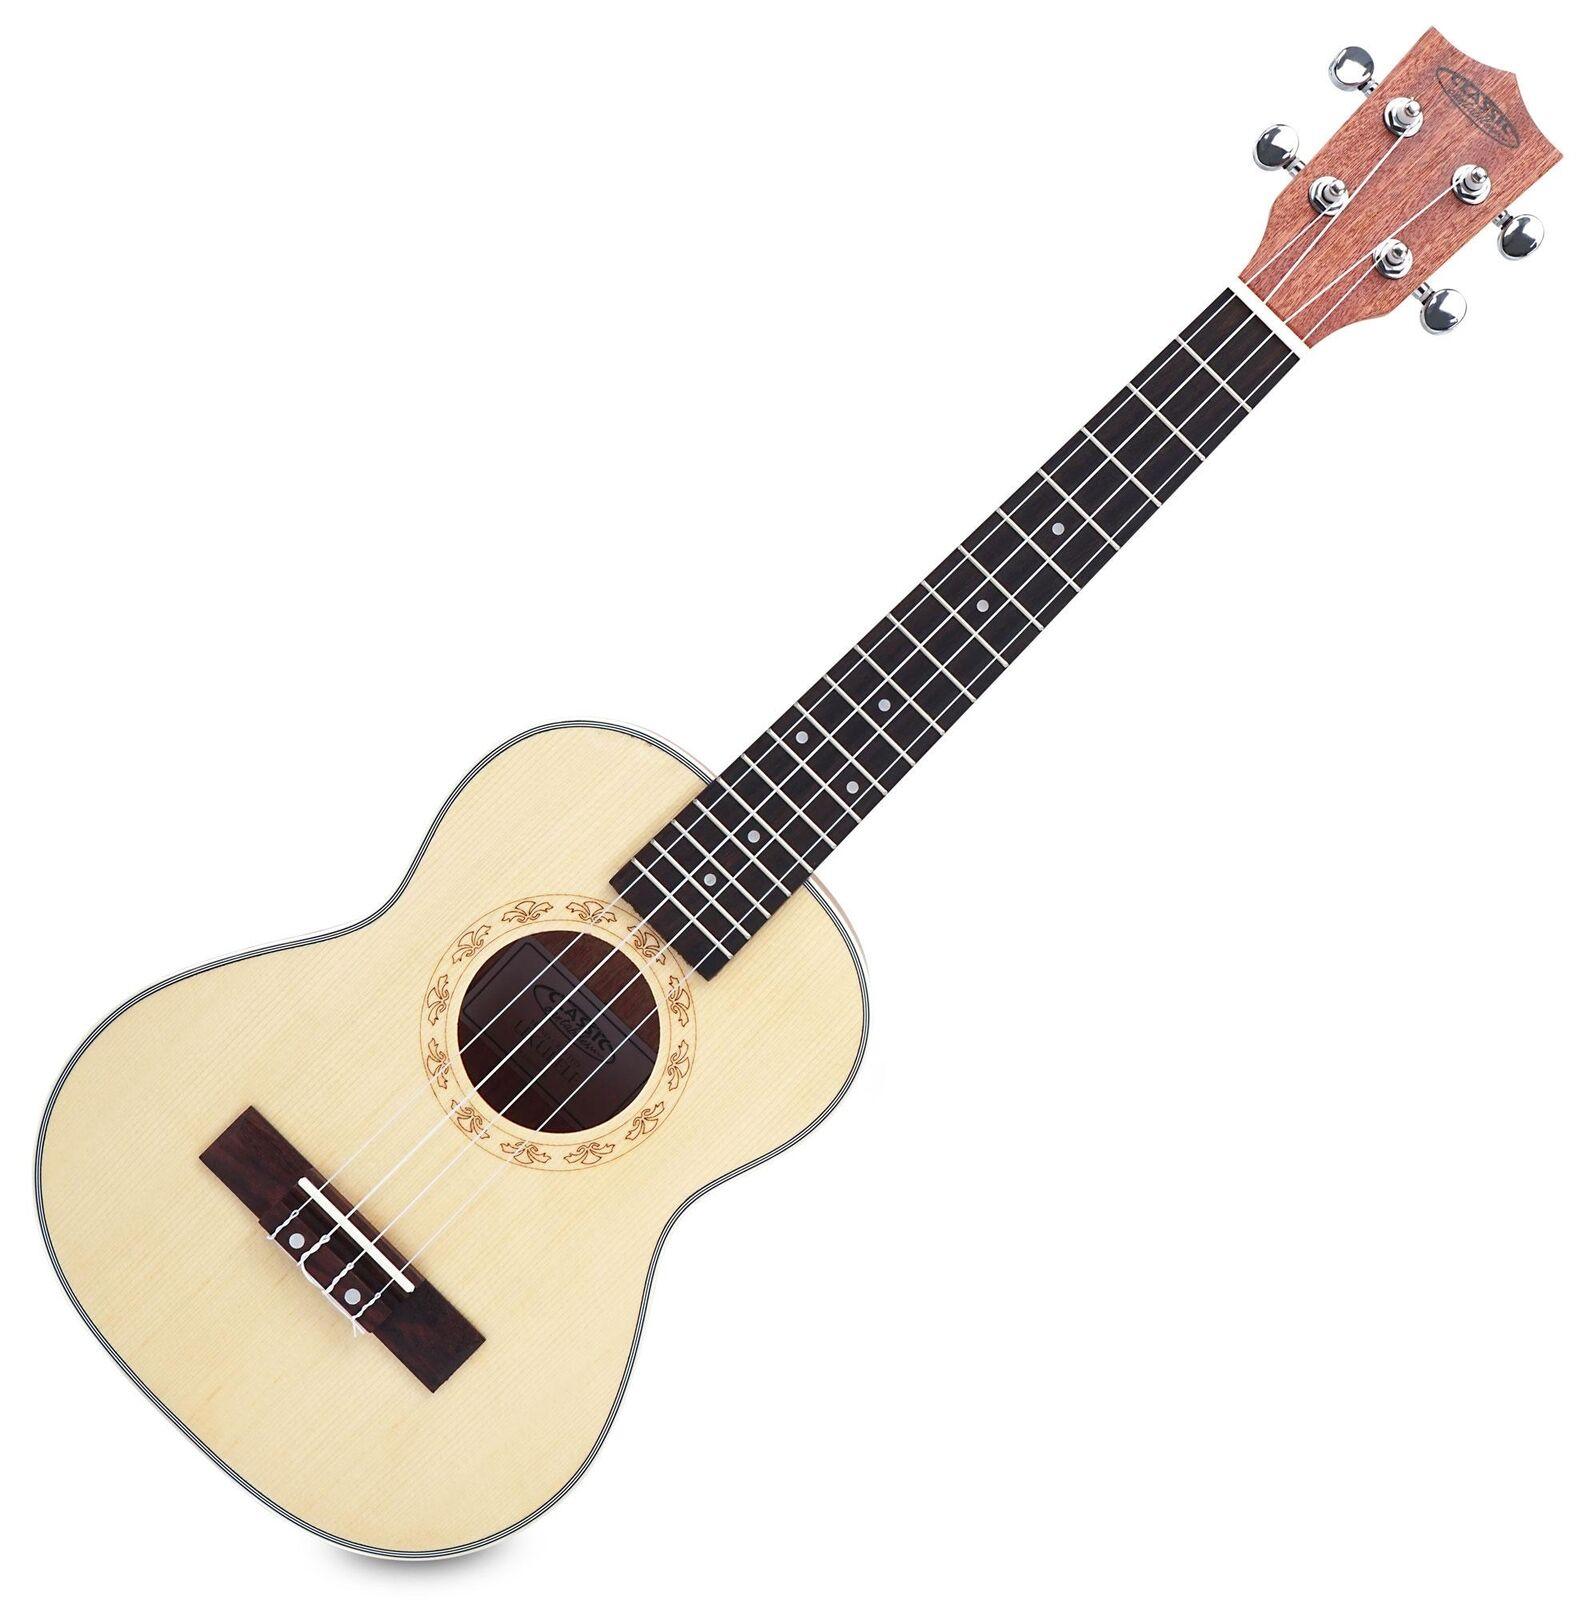 Tenor Ukulele Holz Hawaii Mini Gitarre Kinder Uke Tenor Mensur Natur